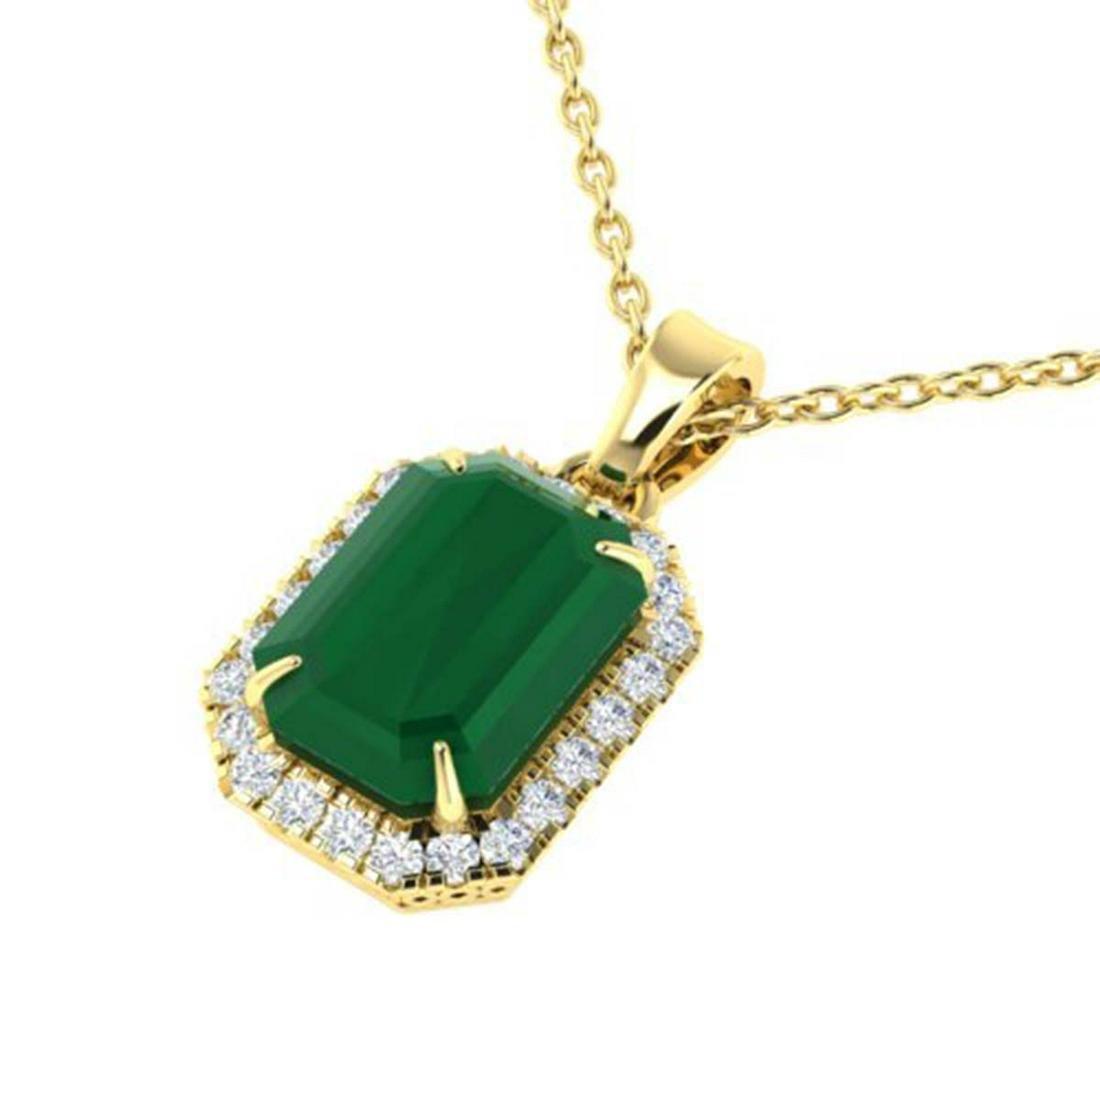 5.50 ctw Emerald & VS/SI Diamond Necklace 18K Yellow